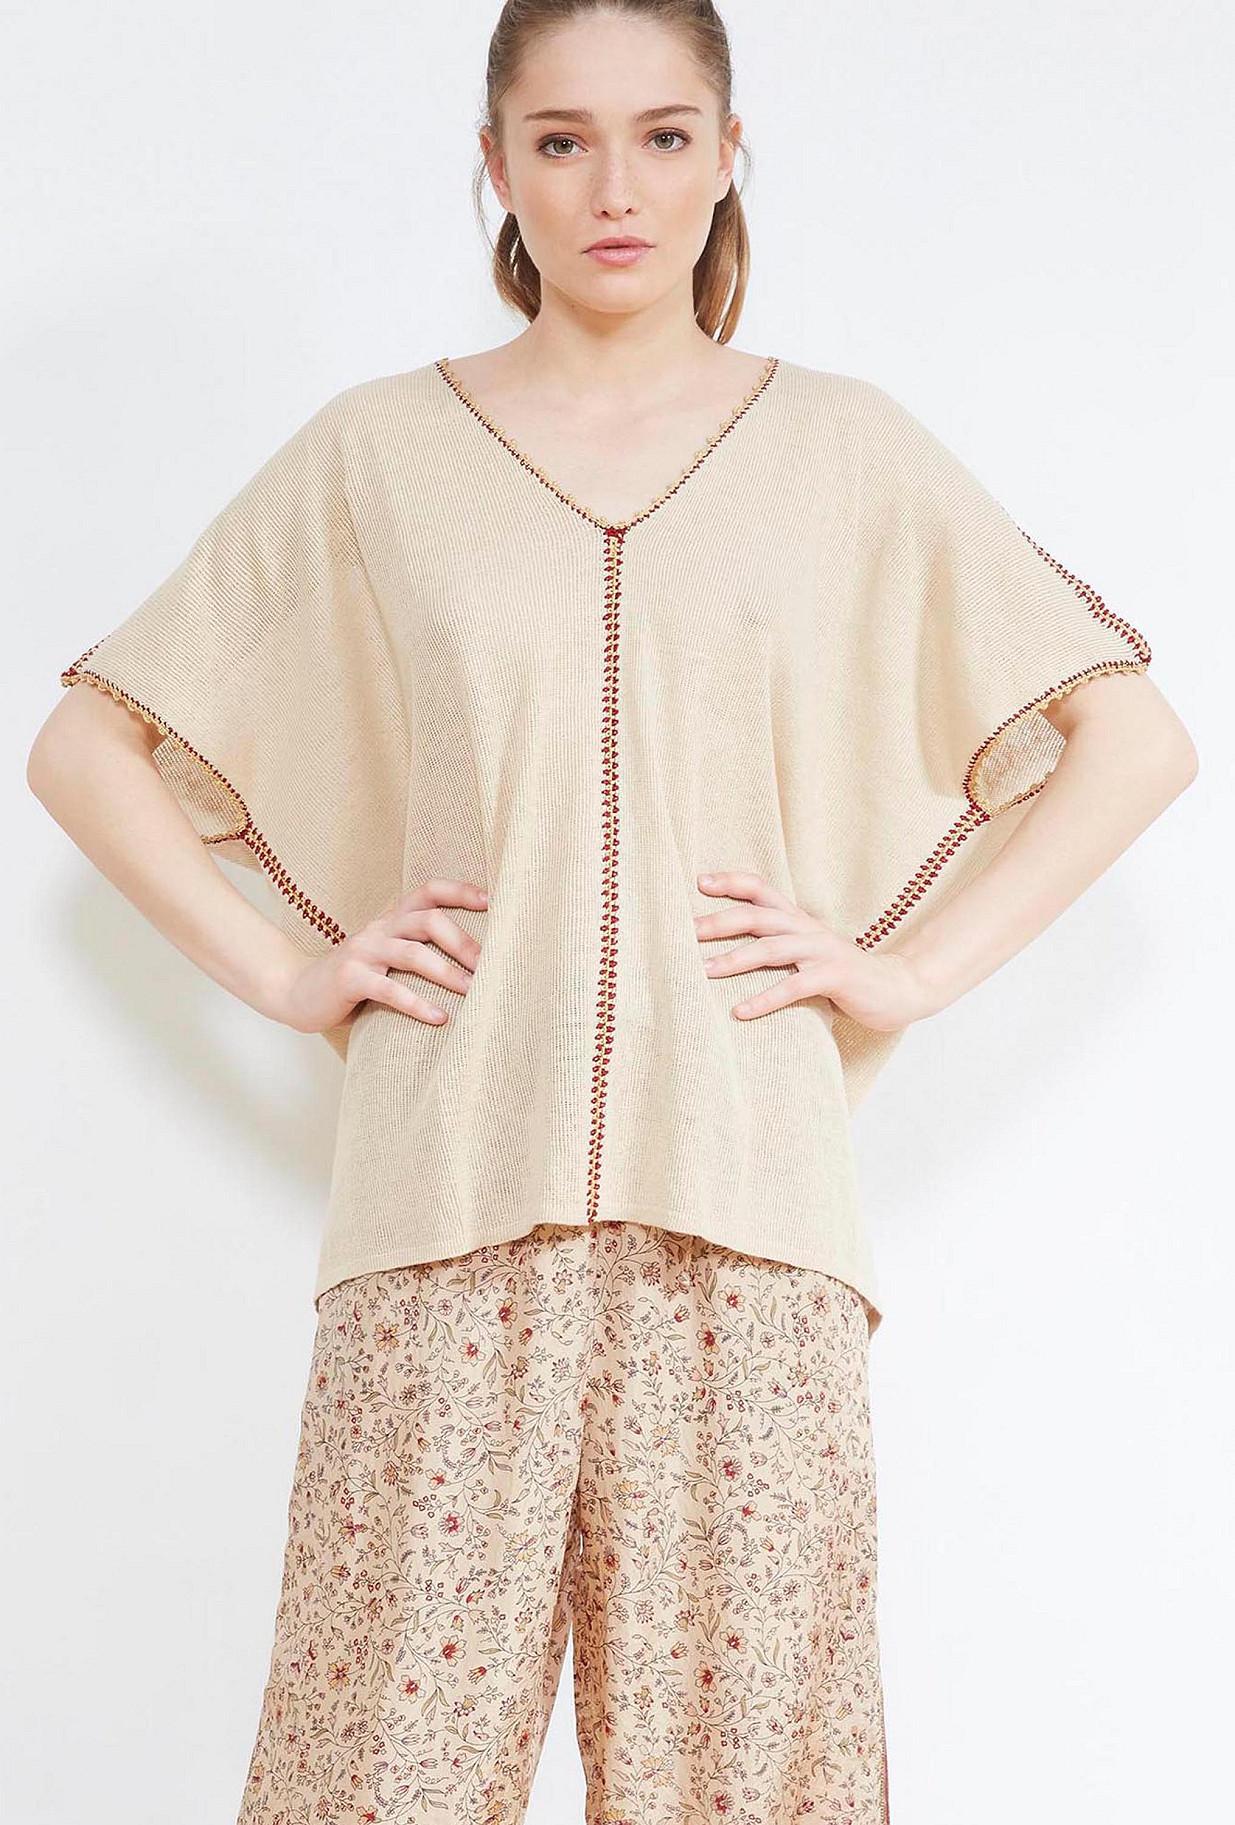 clothes store PONCHO  Talula french designer fashion Paris